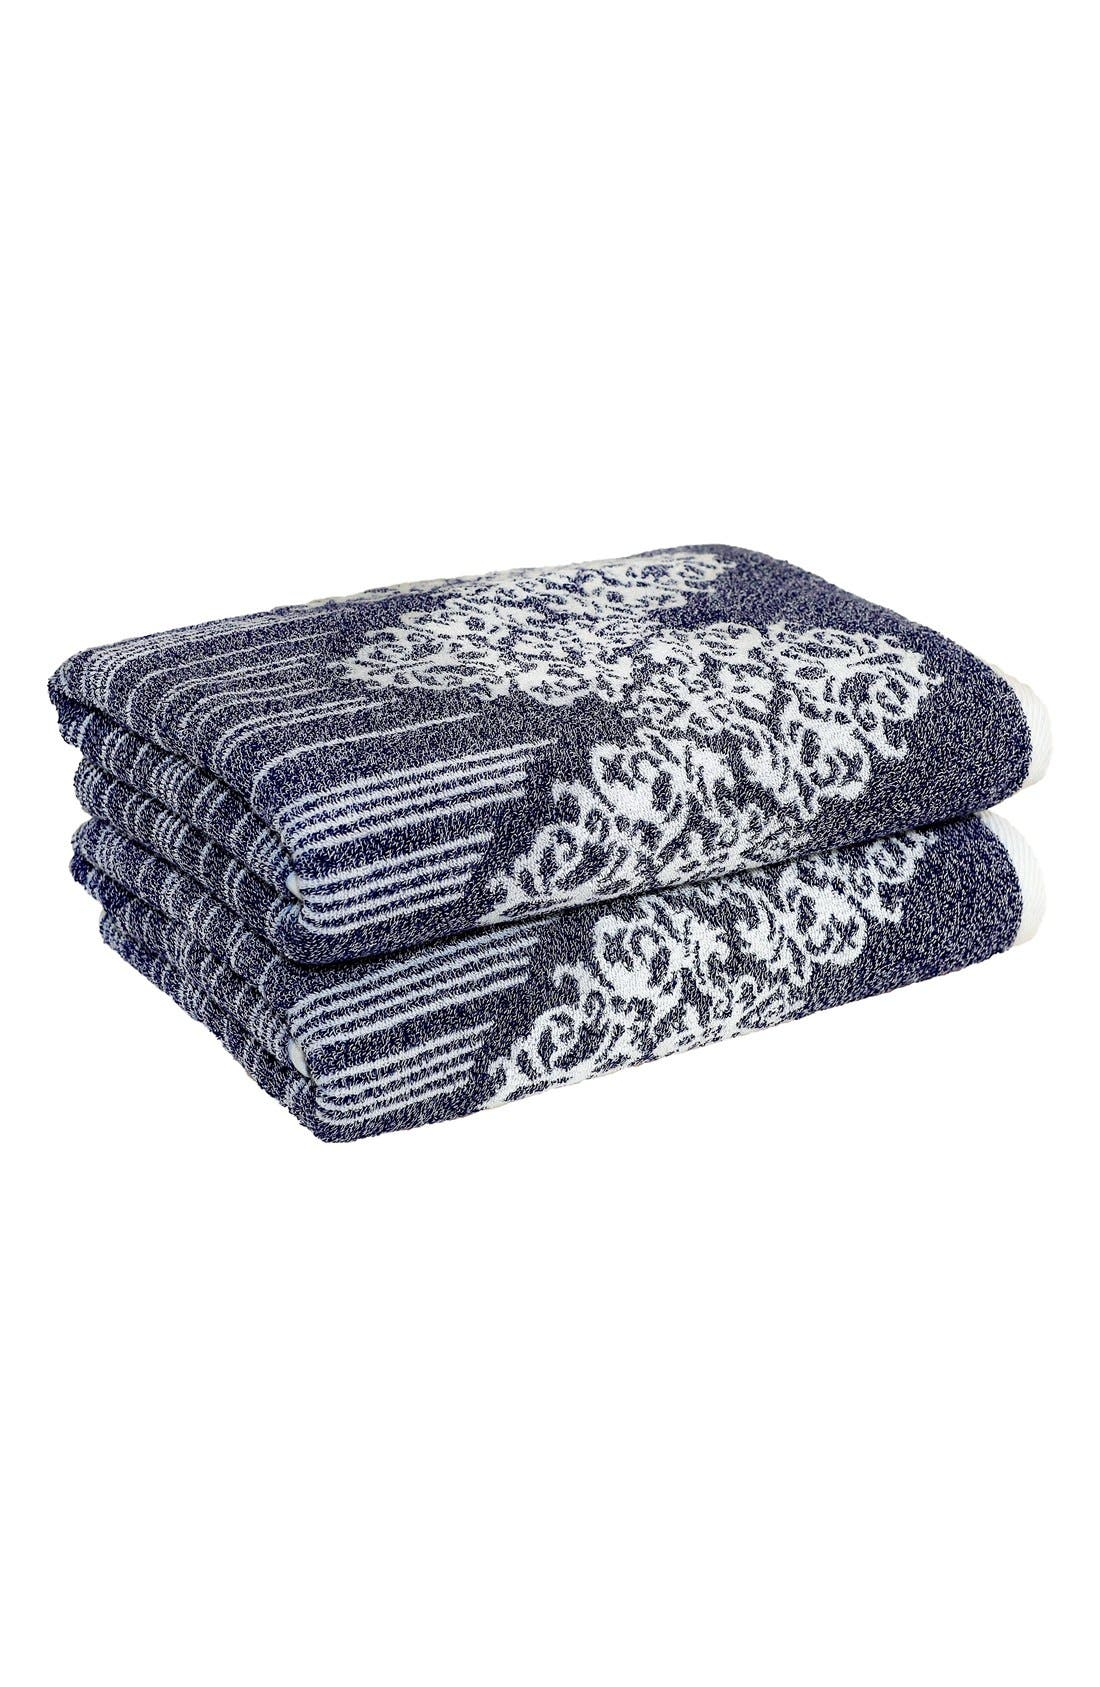 Linum 'Gioia' Turkish Cotton Bath Towels (Set of 2)